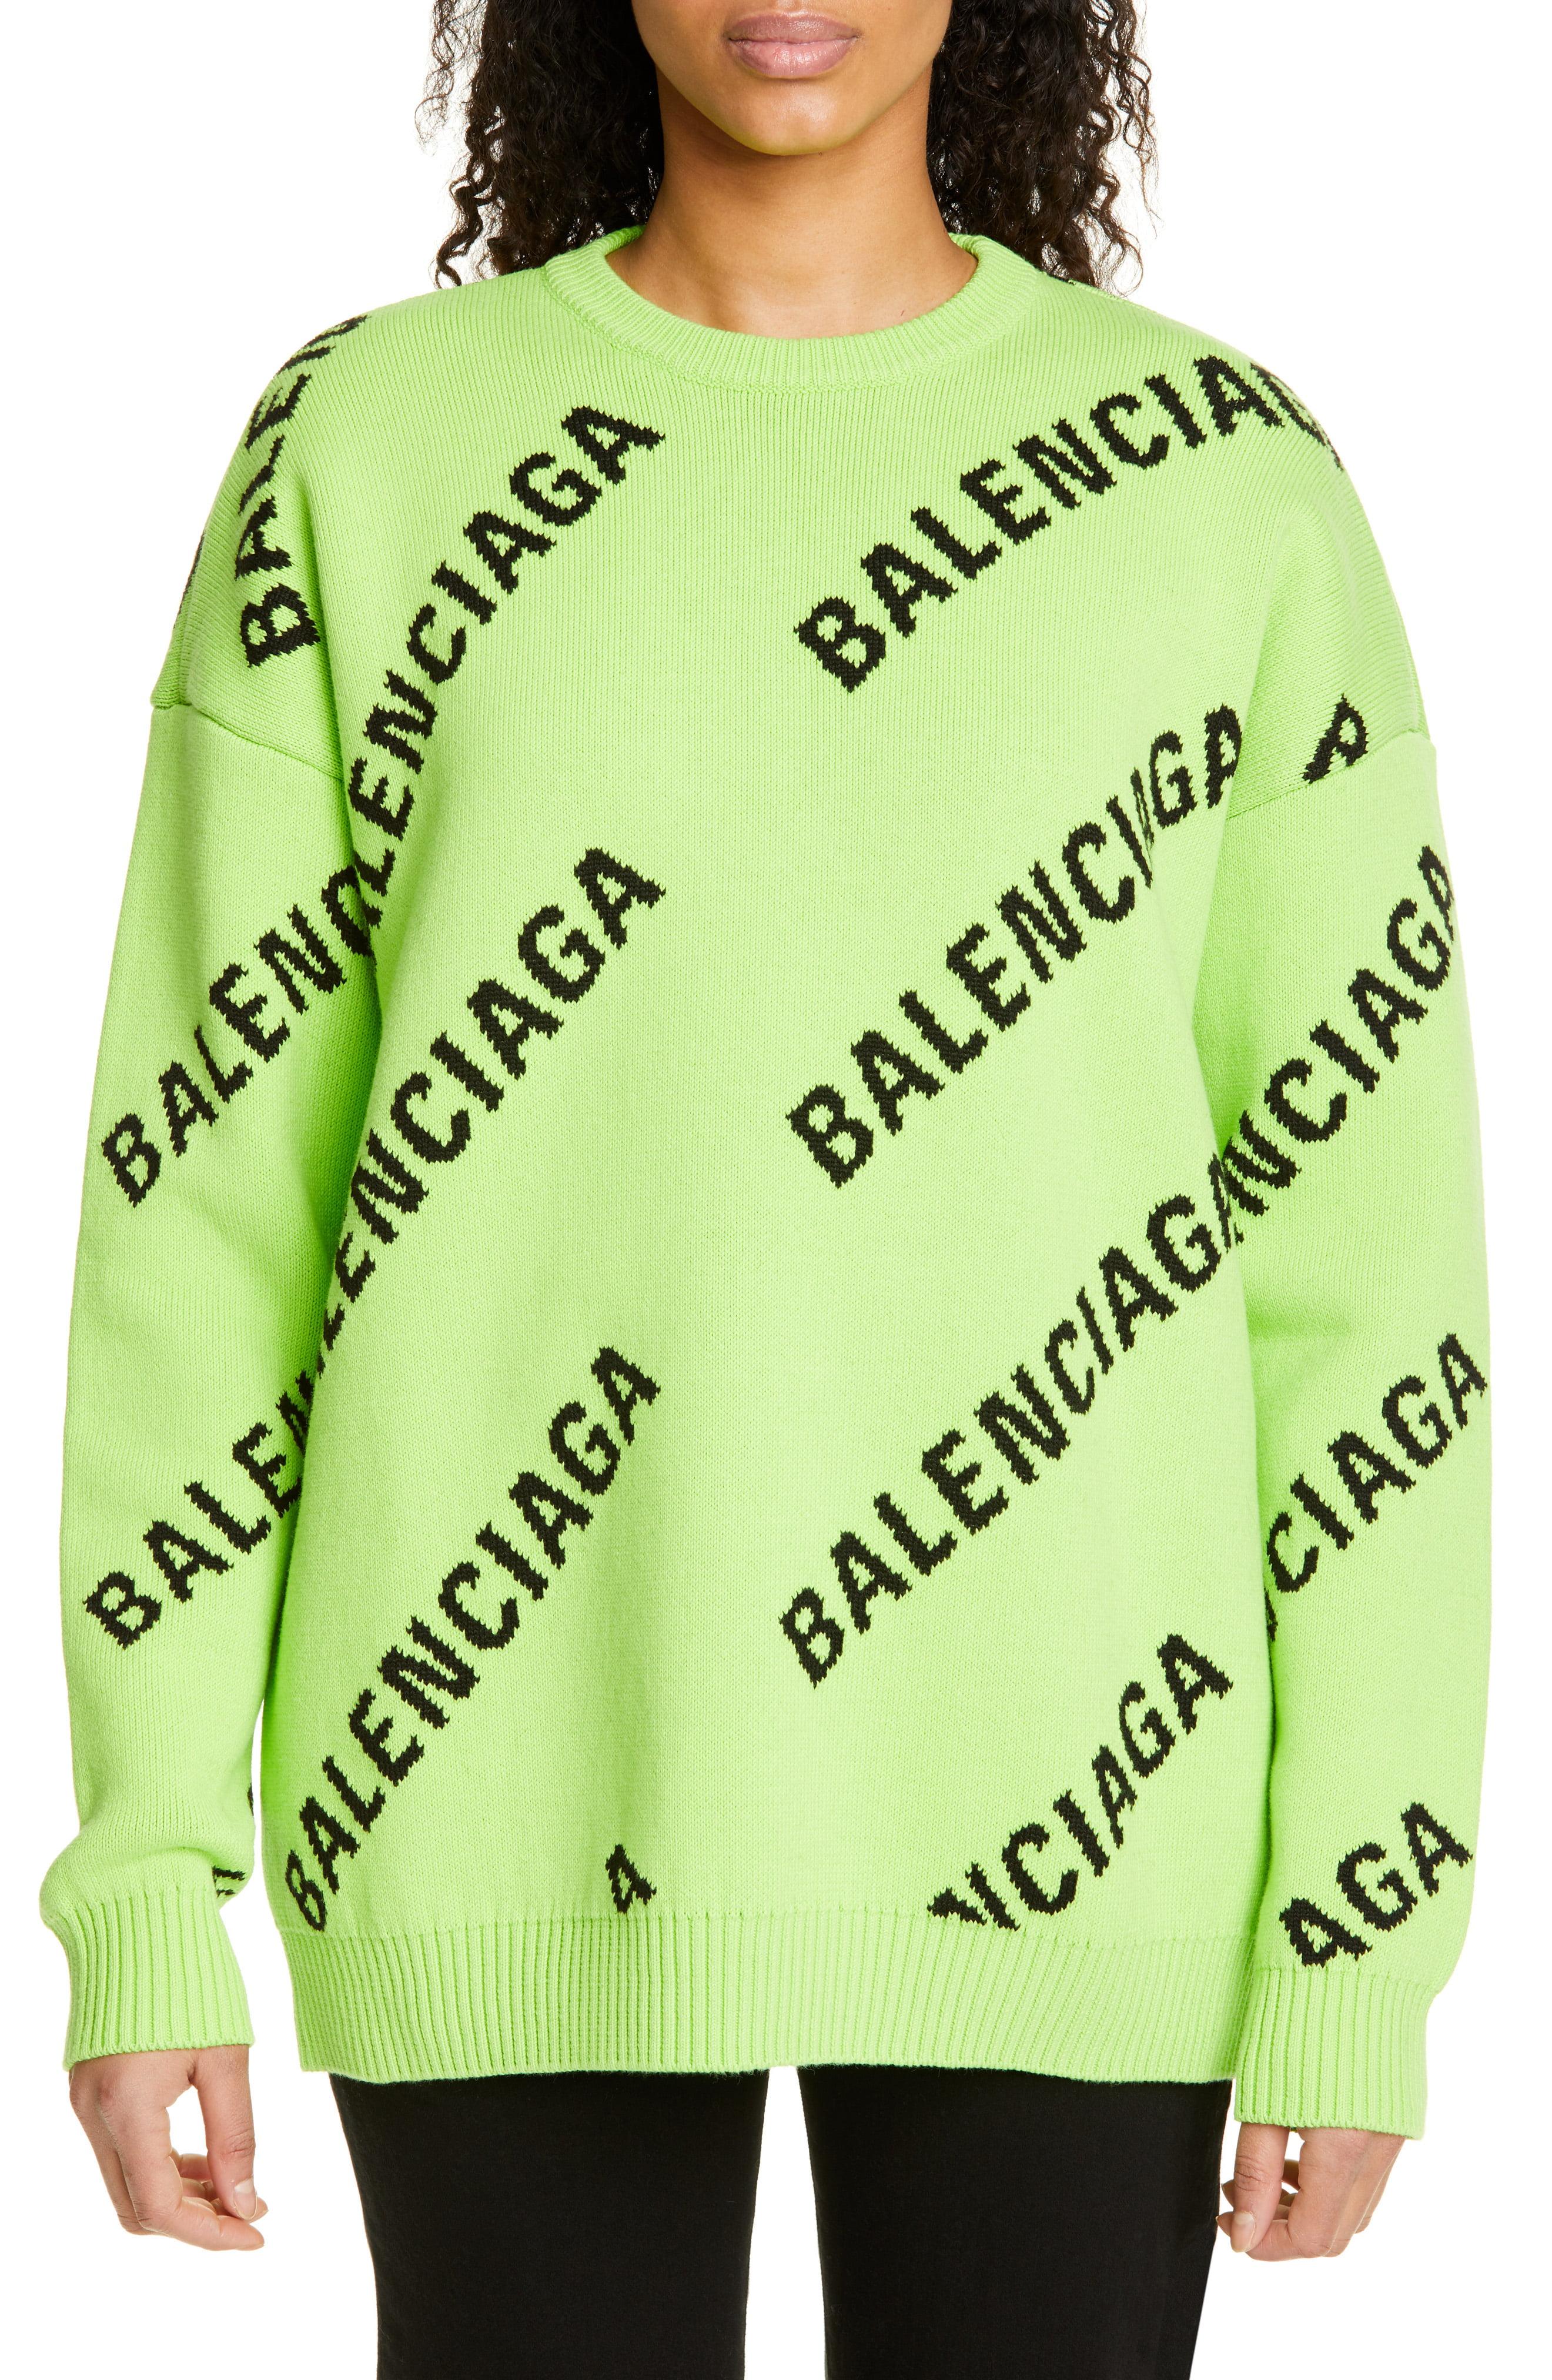 Women S Balenciaga Logo Jacquard Cotton Blend Sweater Size Small Green Sweaters Fashion Clothes Women Sweater Fashion [ 4048 x 2640 Pixel ]